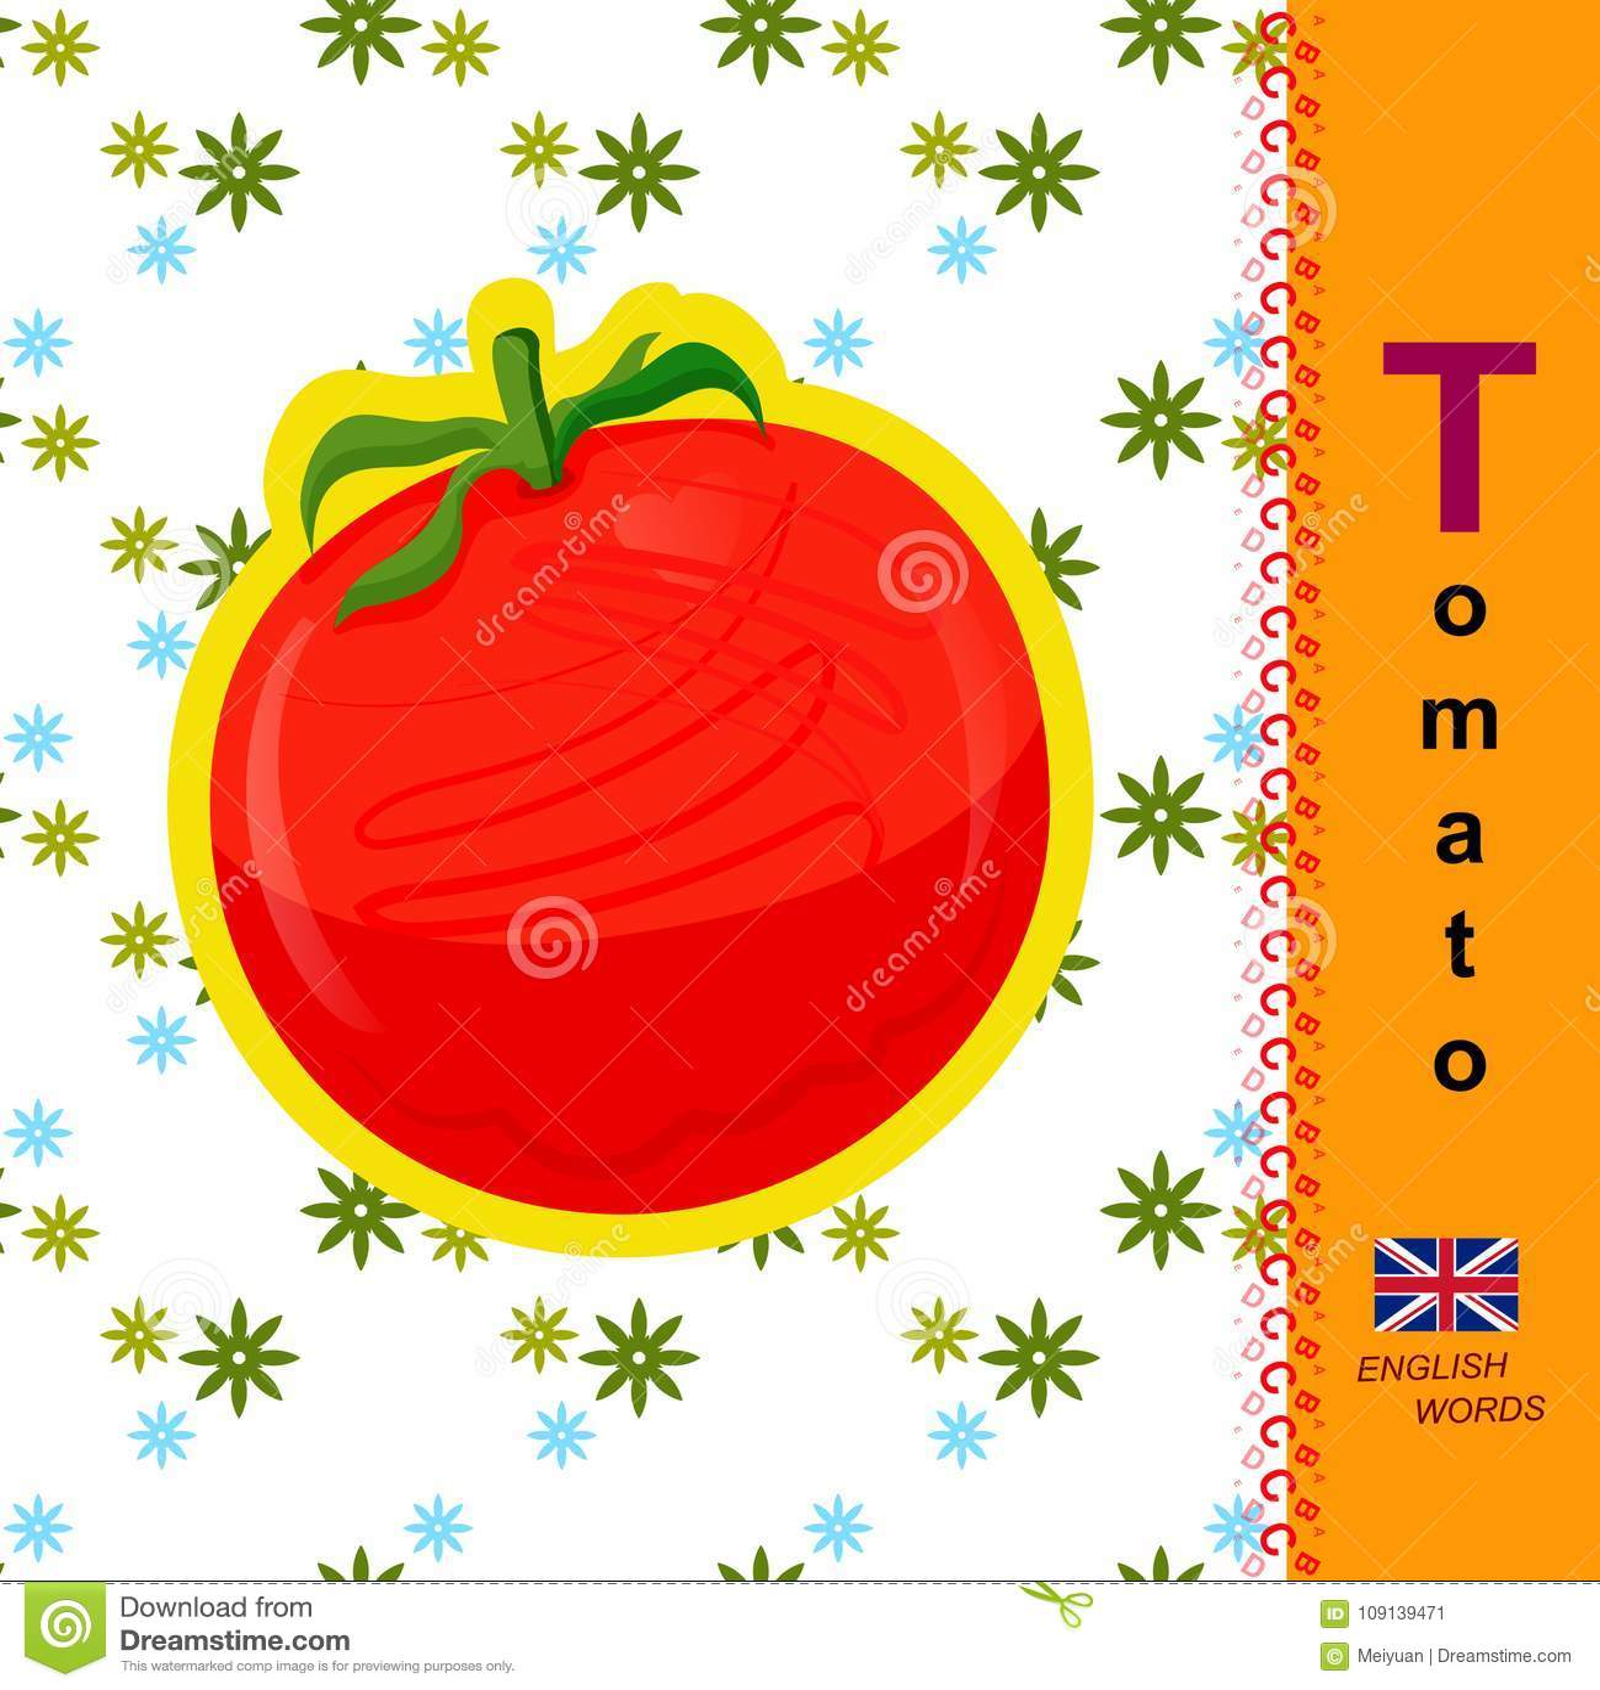 english letter t tomato